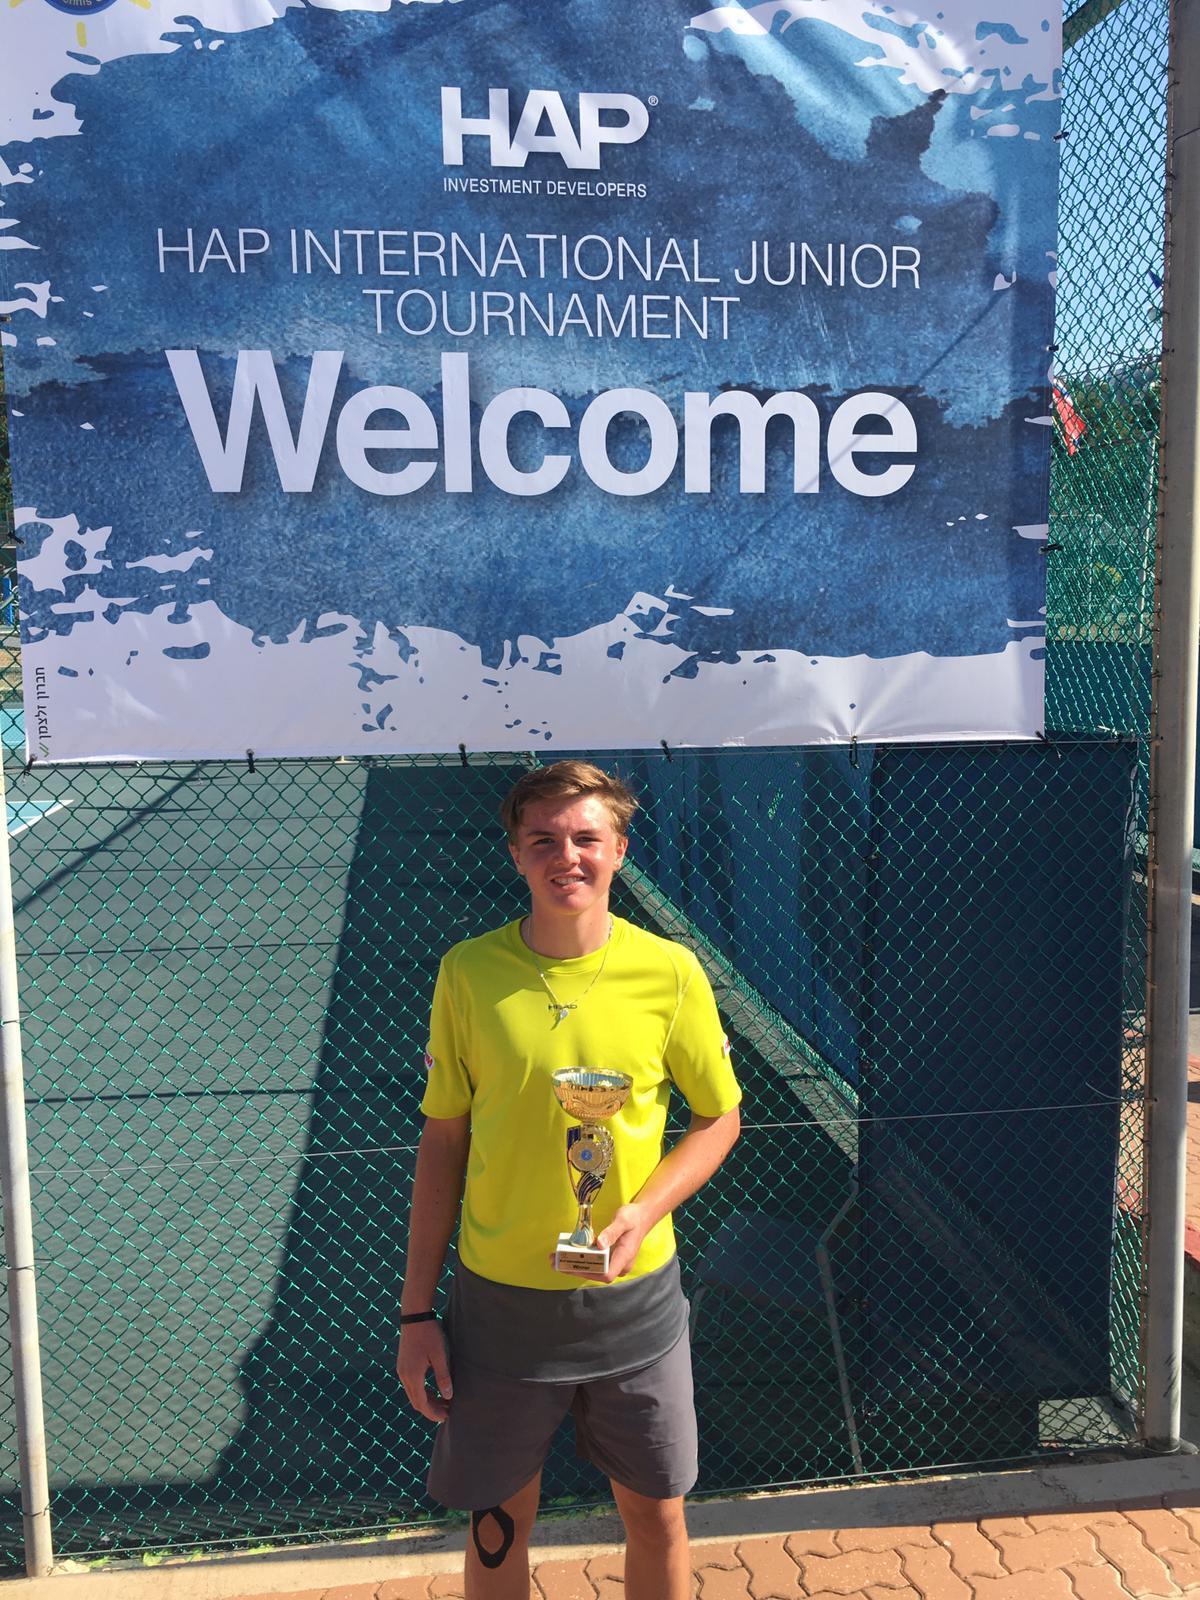 Dominics grösster Erfolg, Grade 2 Gewinner in Israel